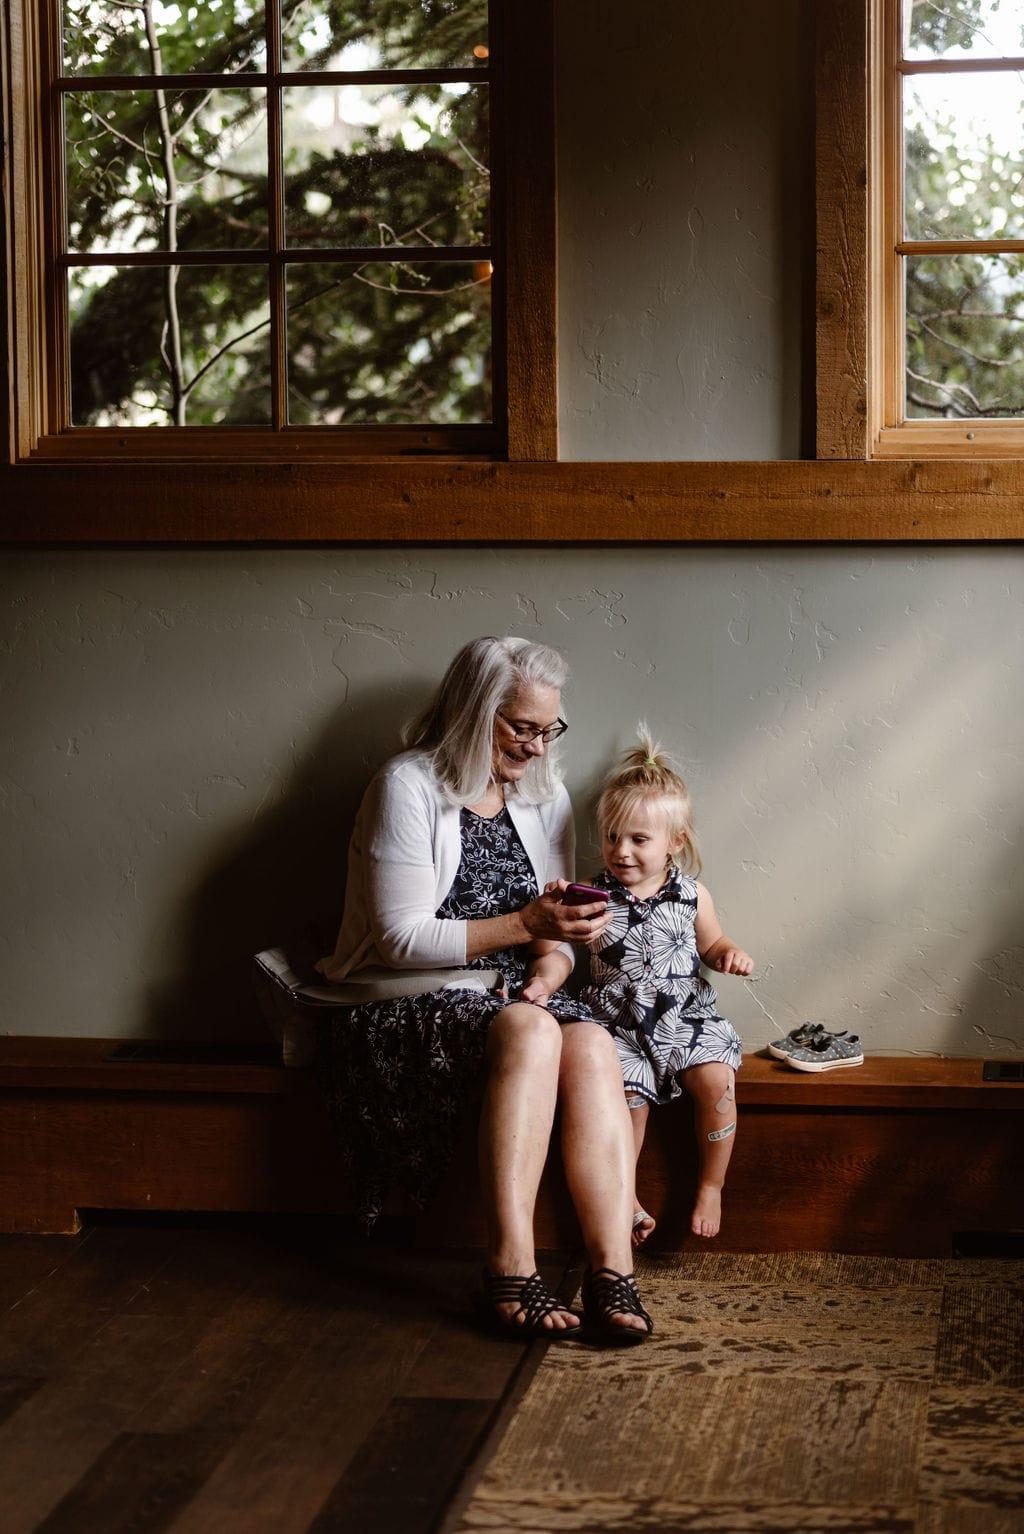 Grandma and child at wedding